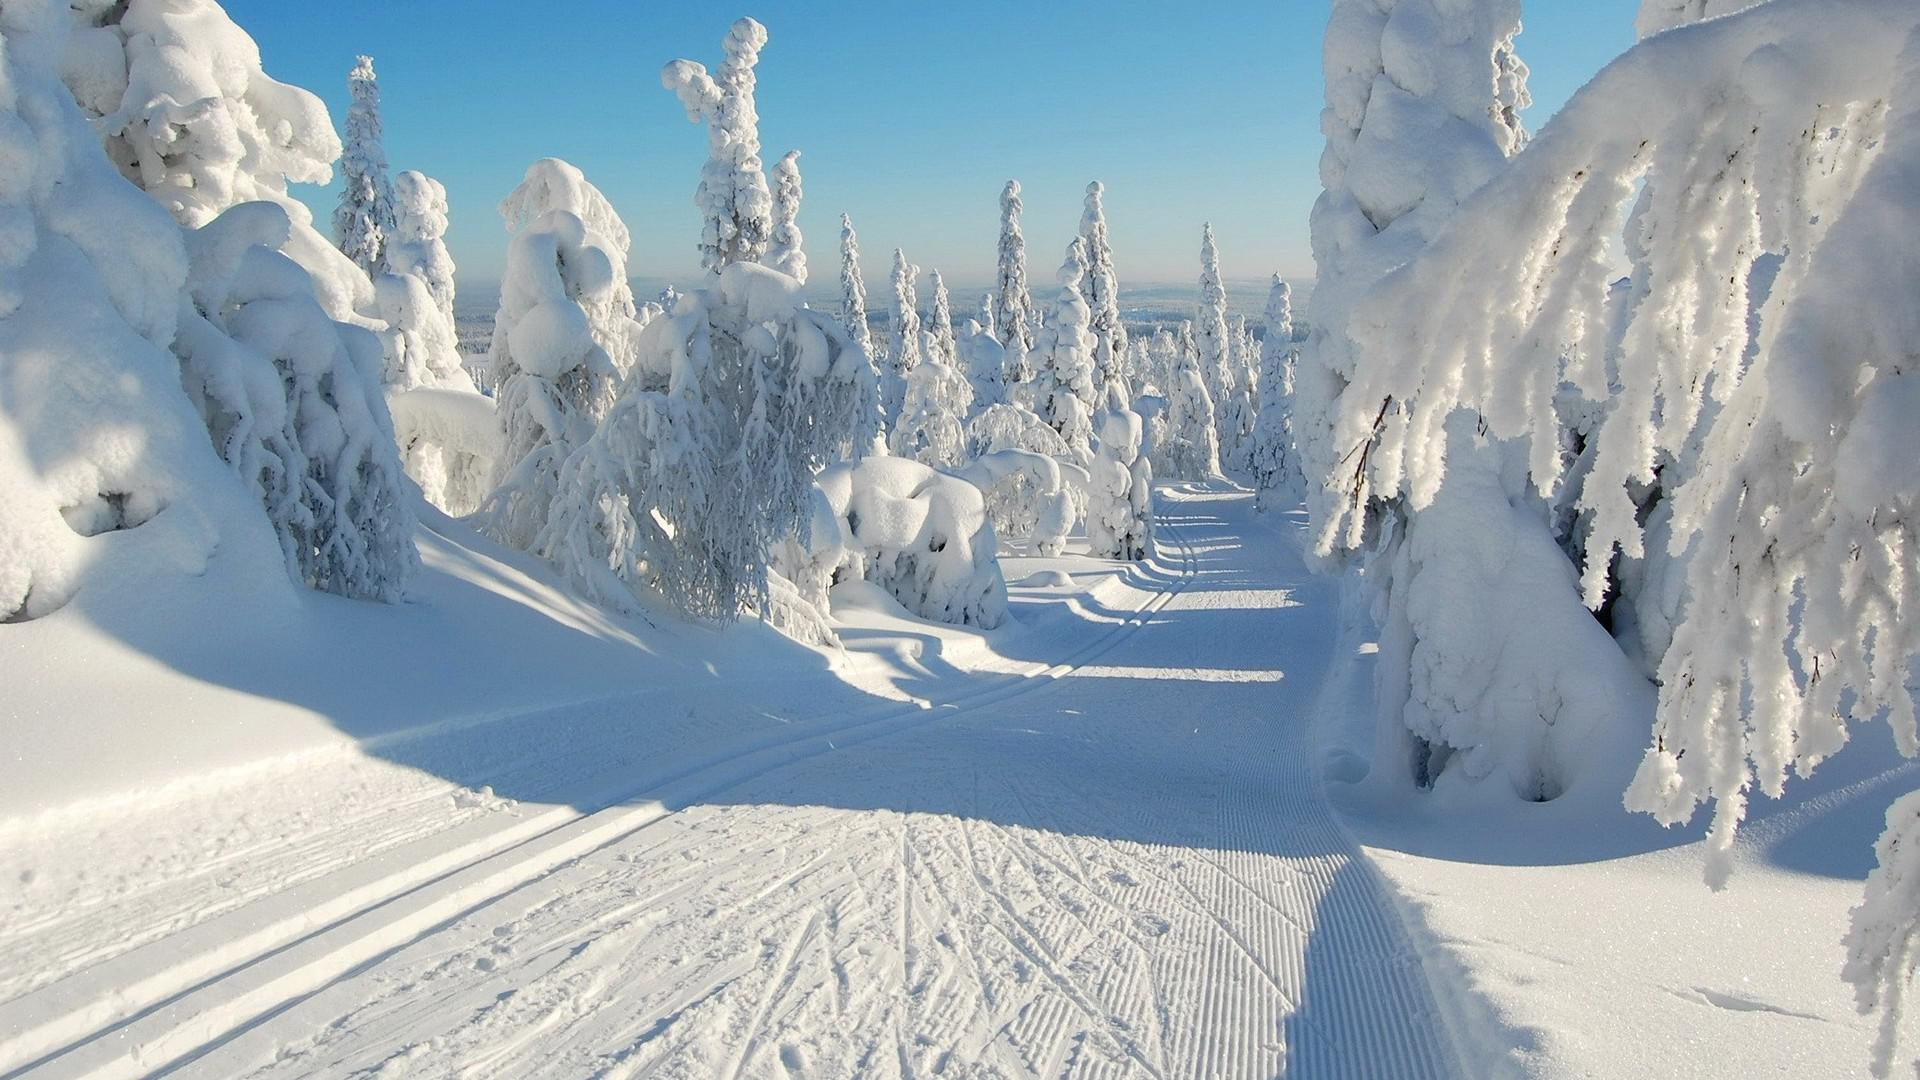 Download Original Tapeta Na Pulpit Sloneczna Zima 1823559